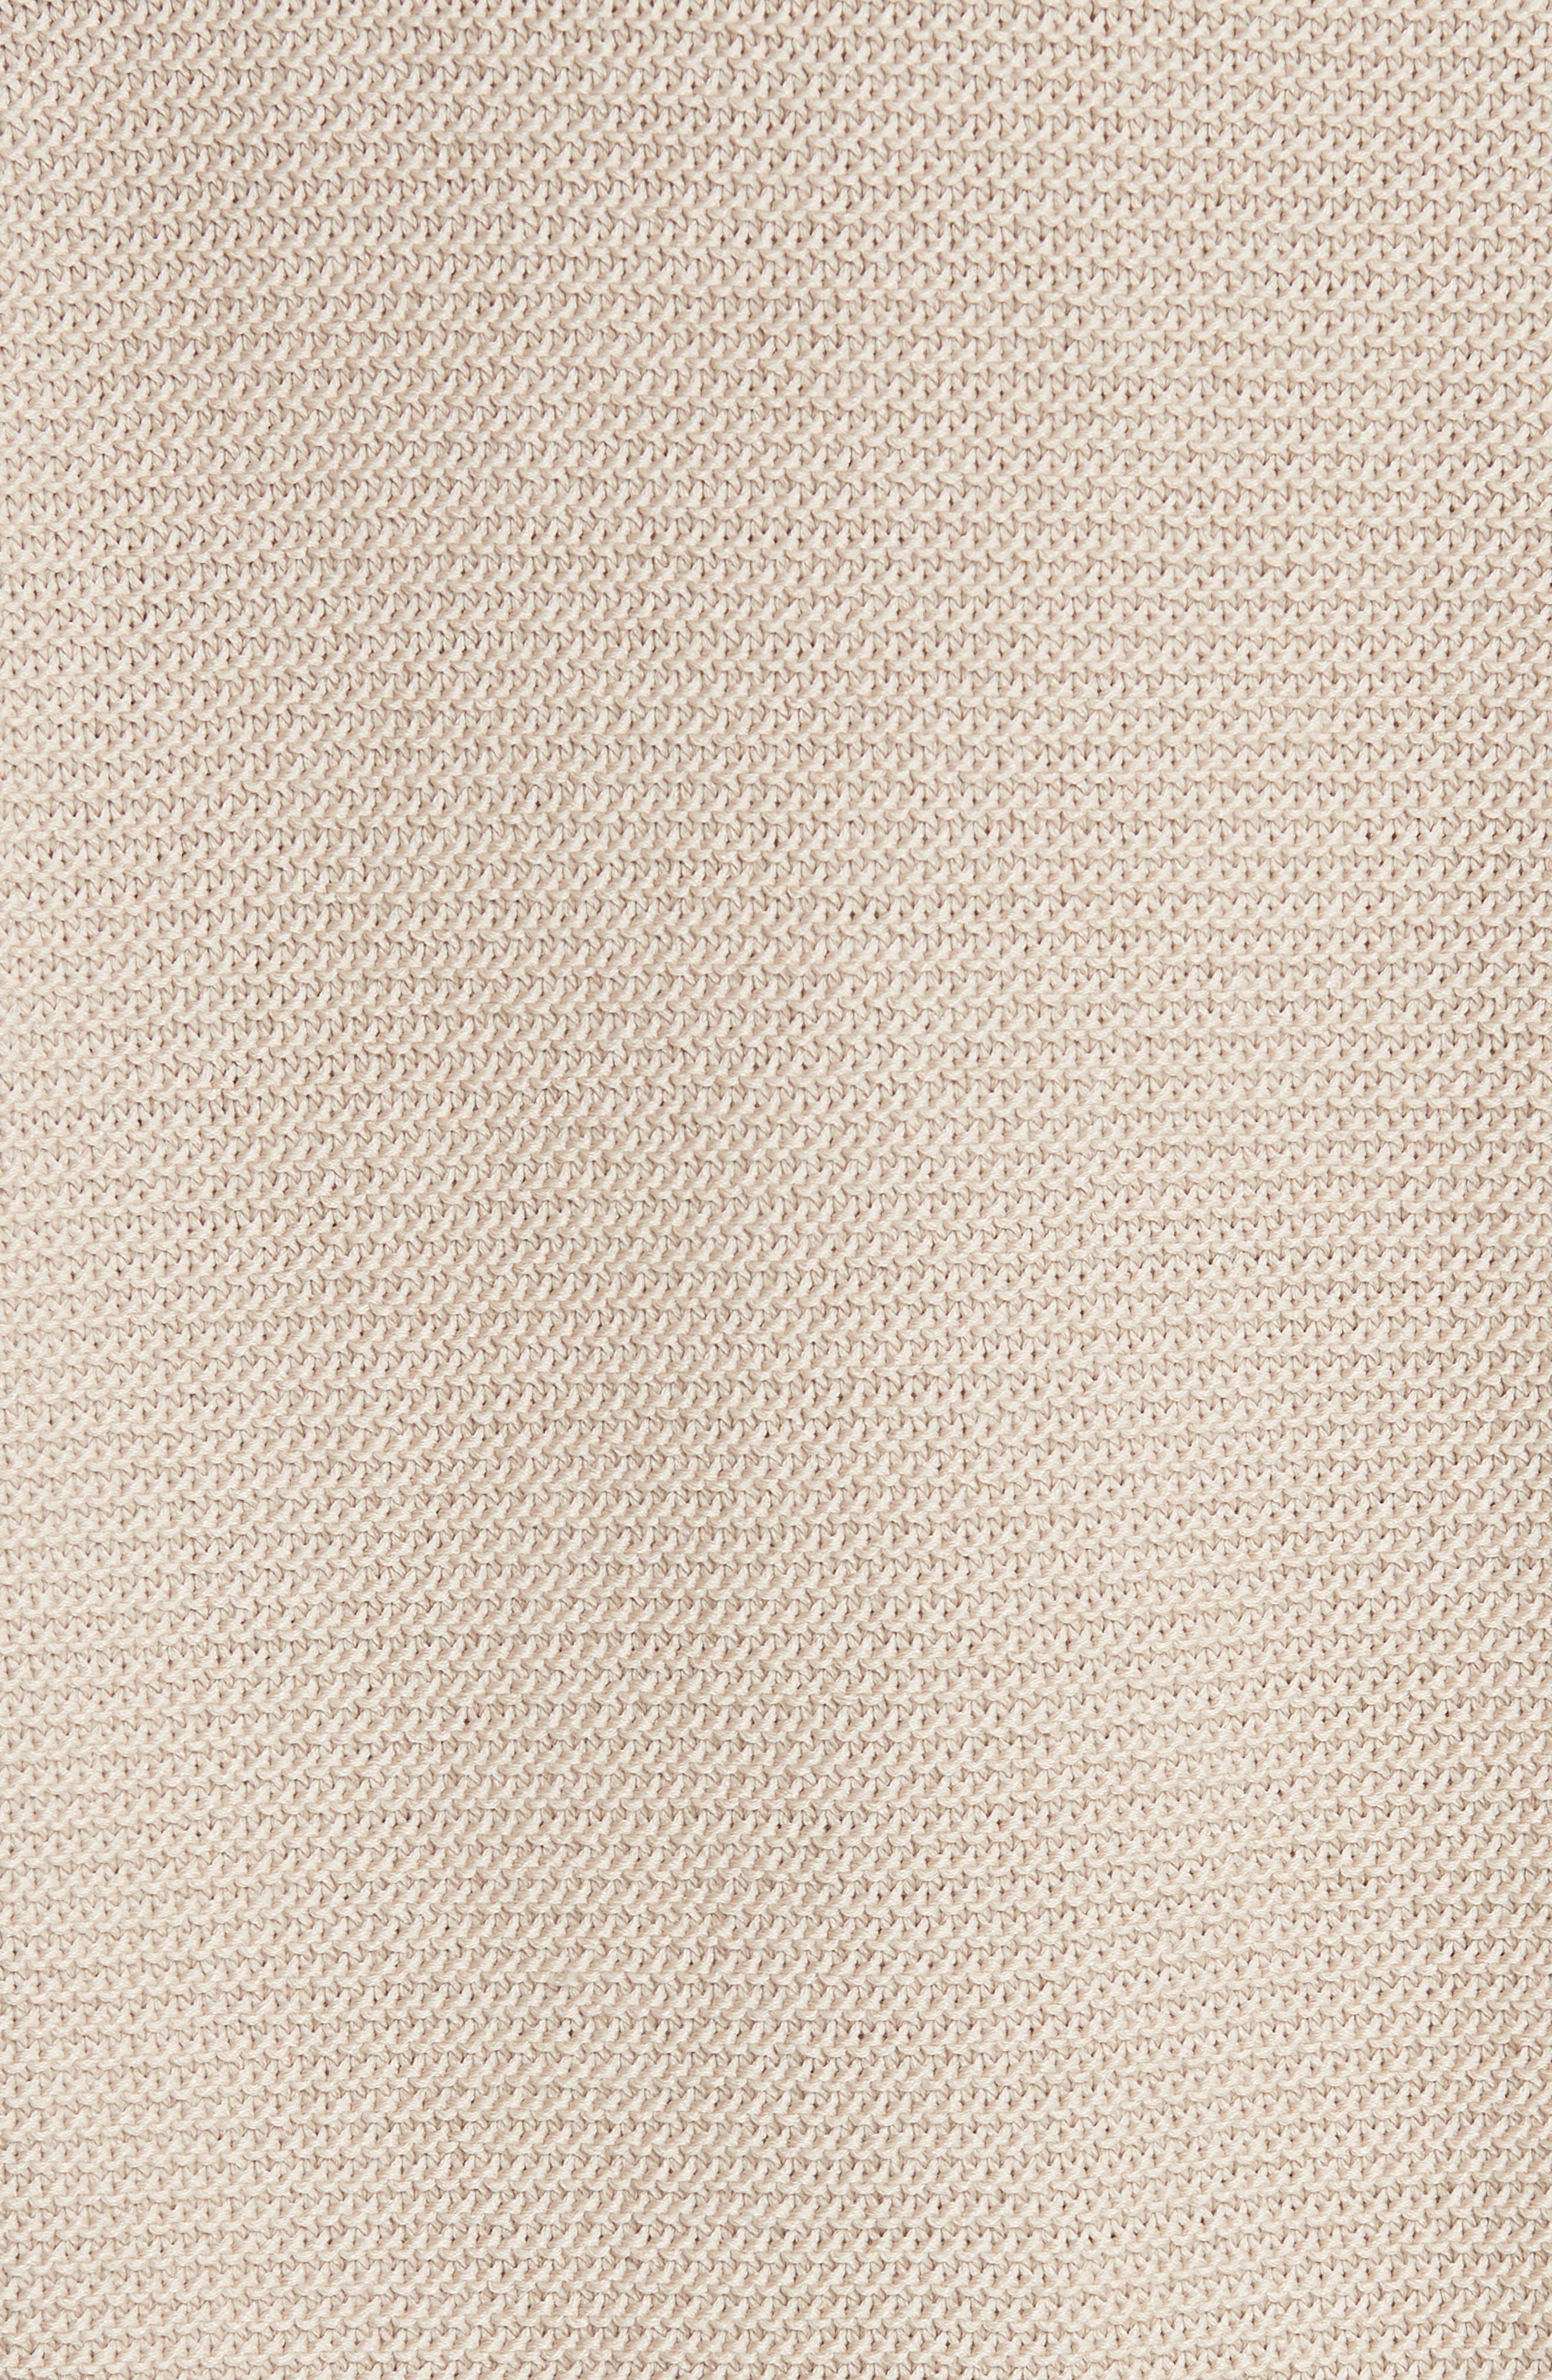 Cotton & Silk Sweater,                             Alternate thumbnail 5, color,                             Khaki